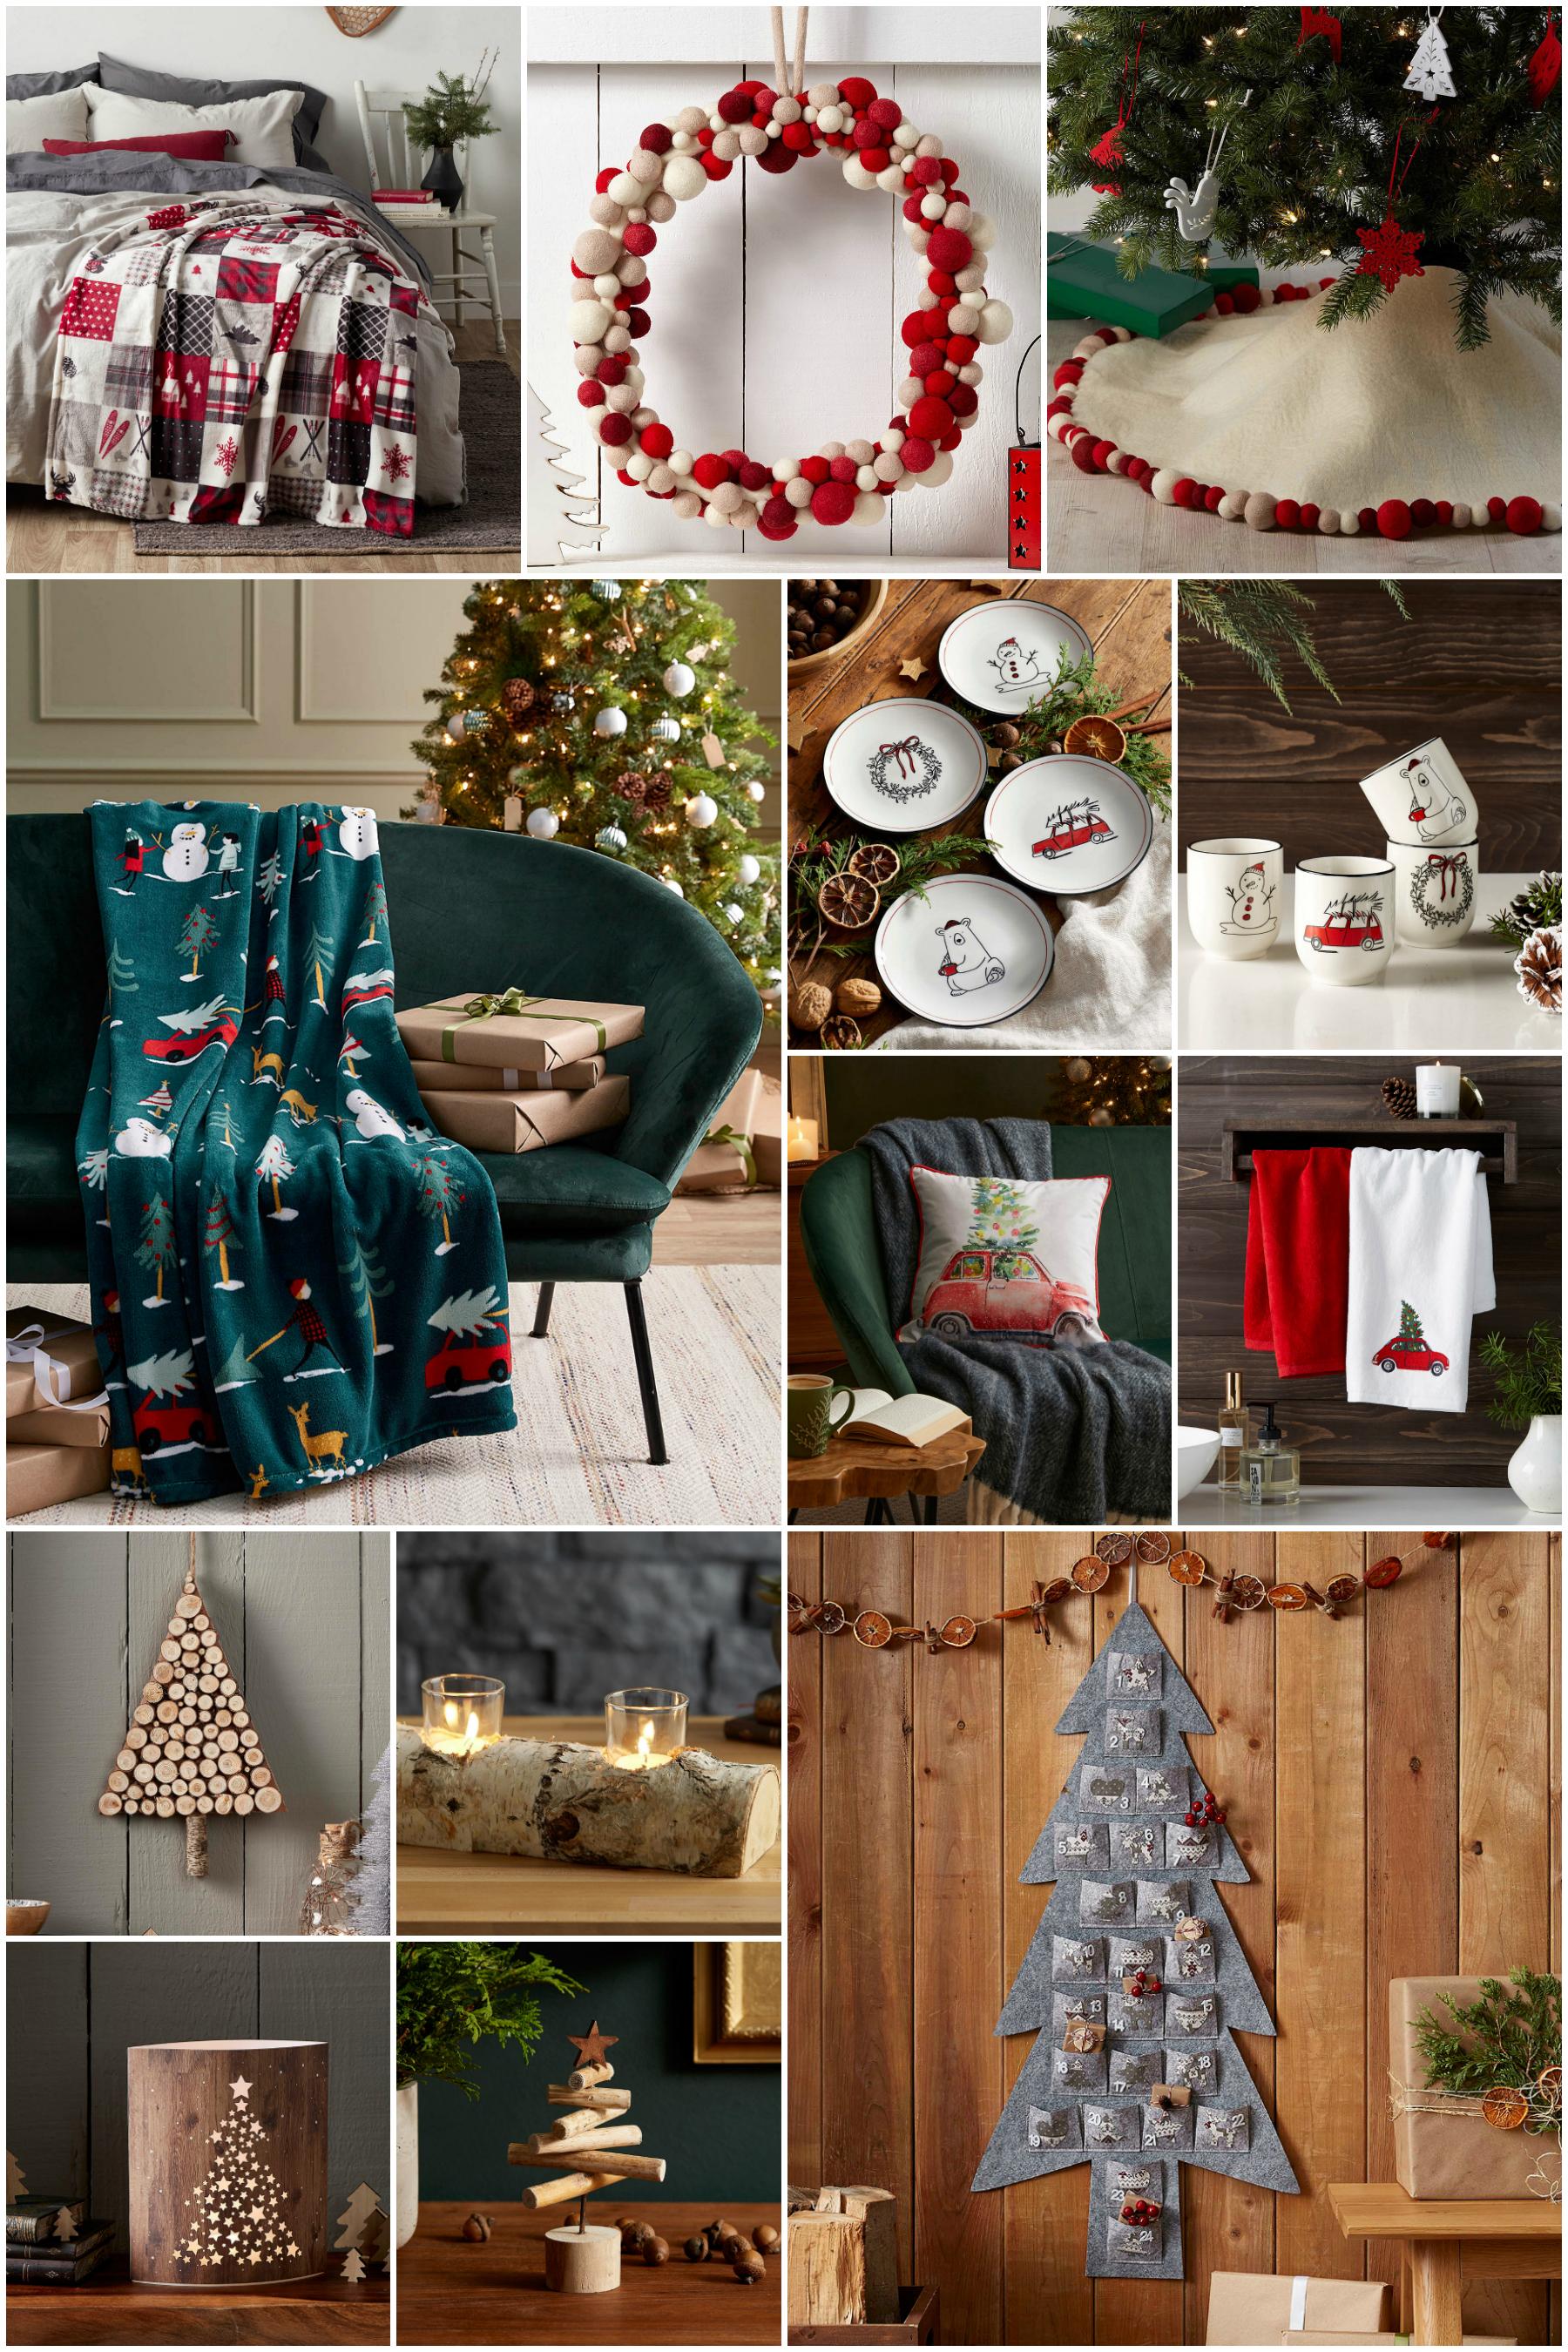 Holiday Decor At Simons - La Maison Simons